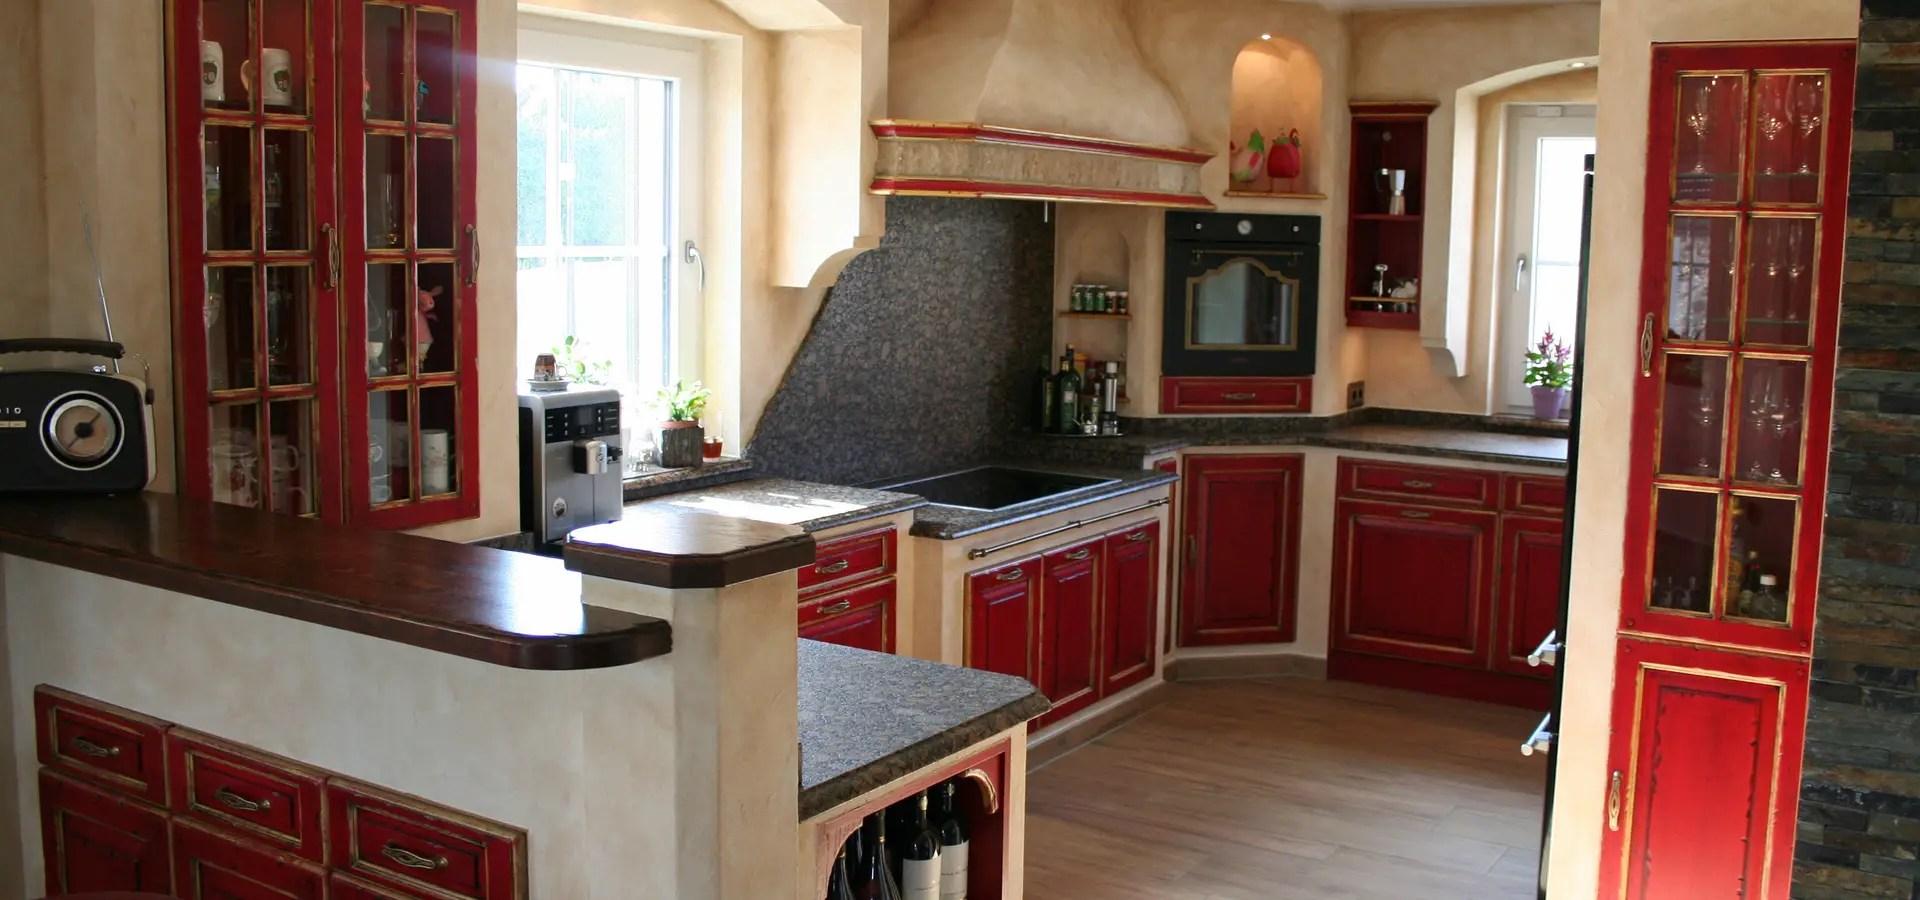 k cheninsel gemauert hochstuhl f r k chentheke. Black Bedroom Furniture Sets. Home Design Ideas